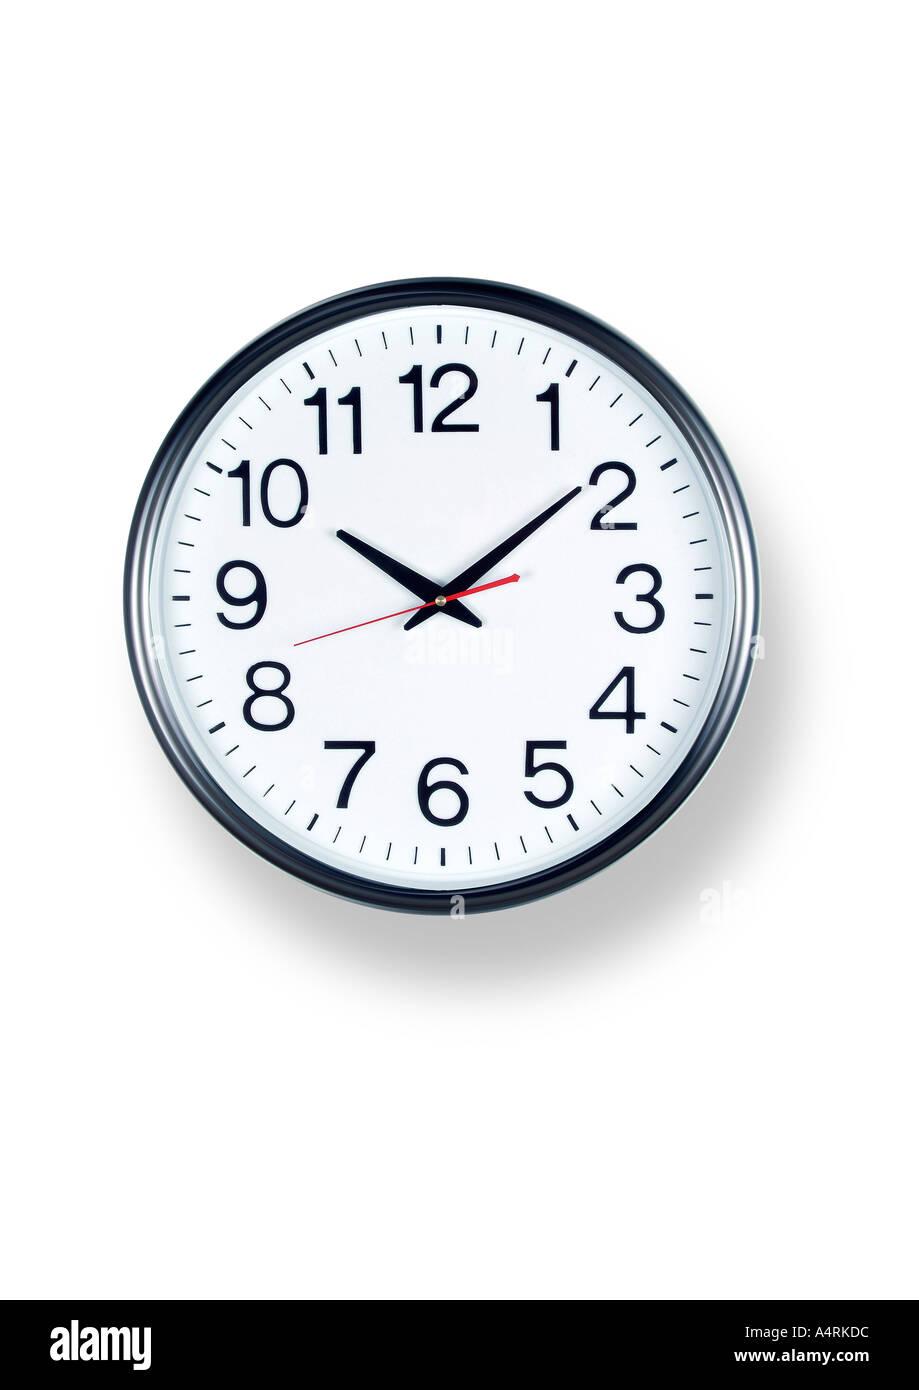 Regarder l horloge Uhr Wanduhr analog Photo Stock